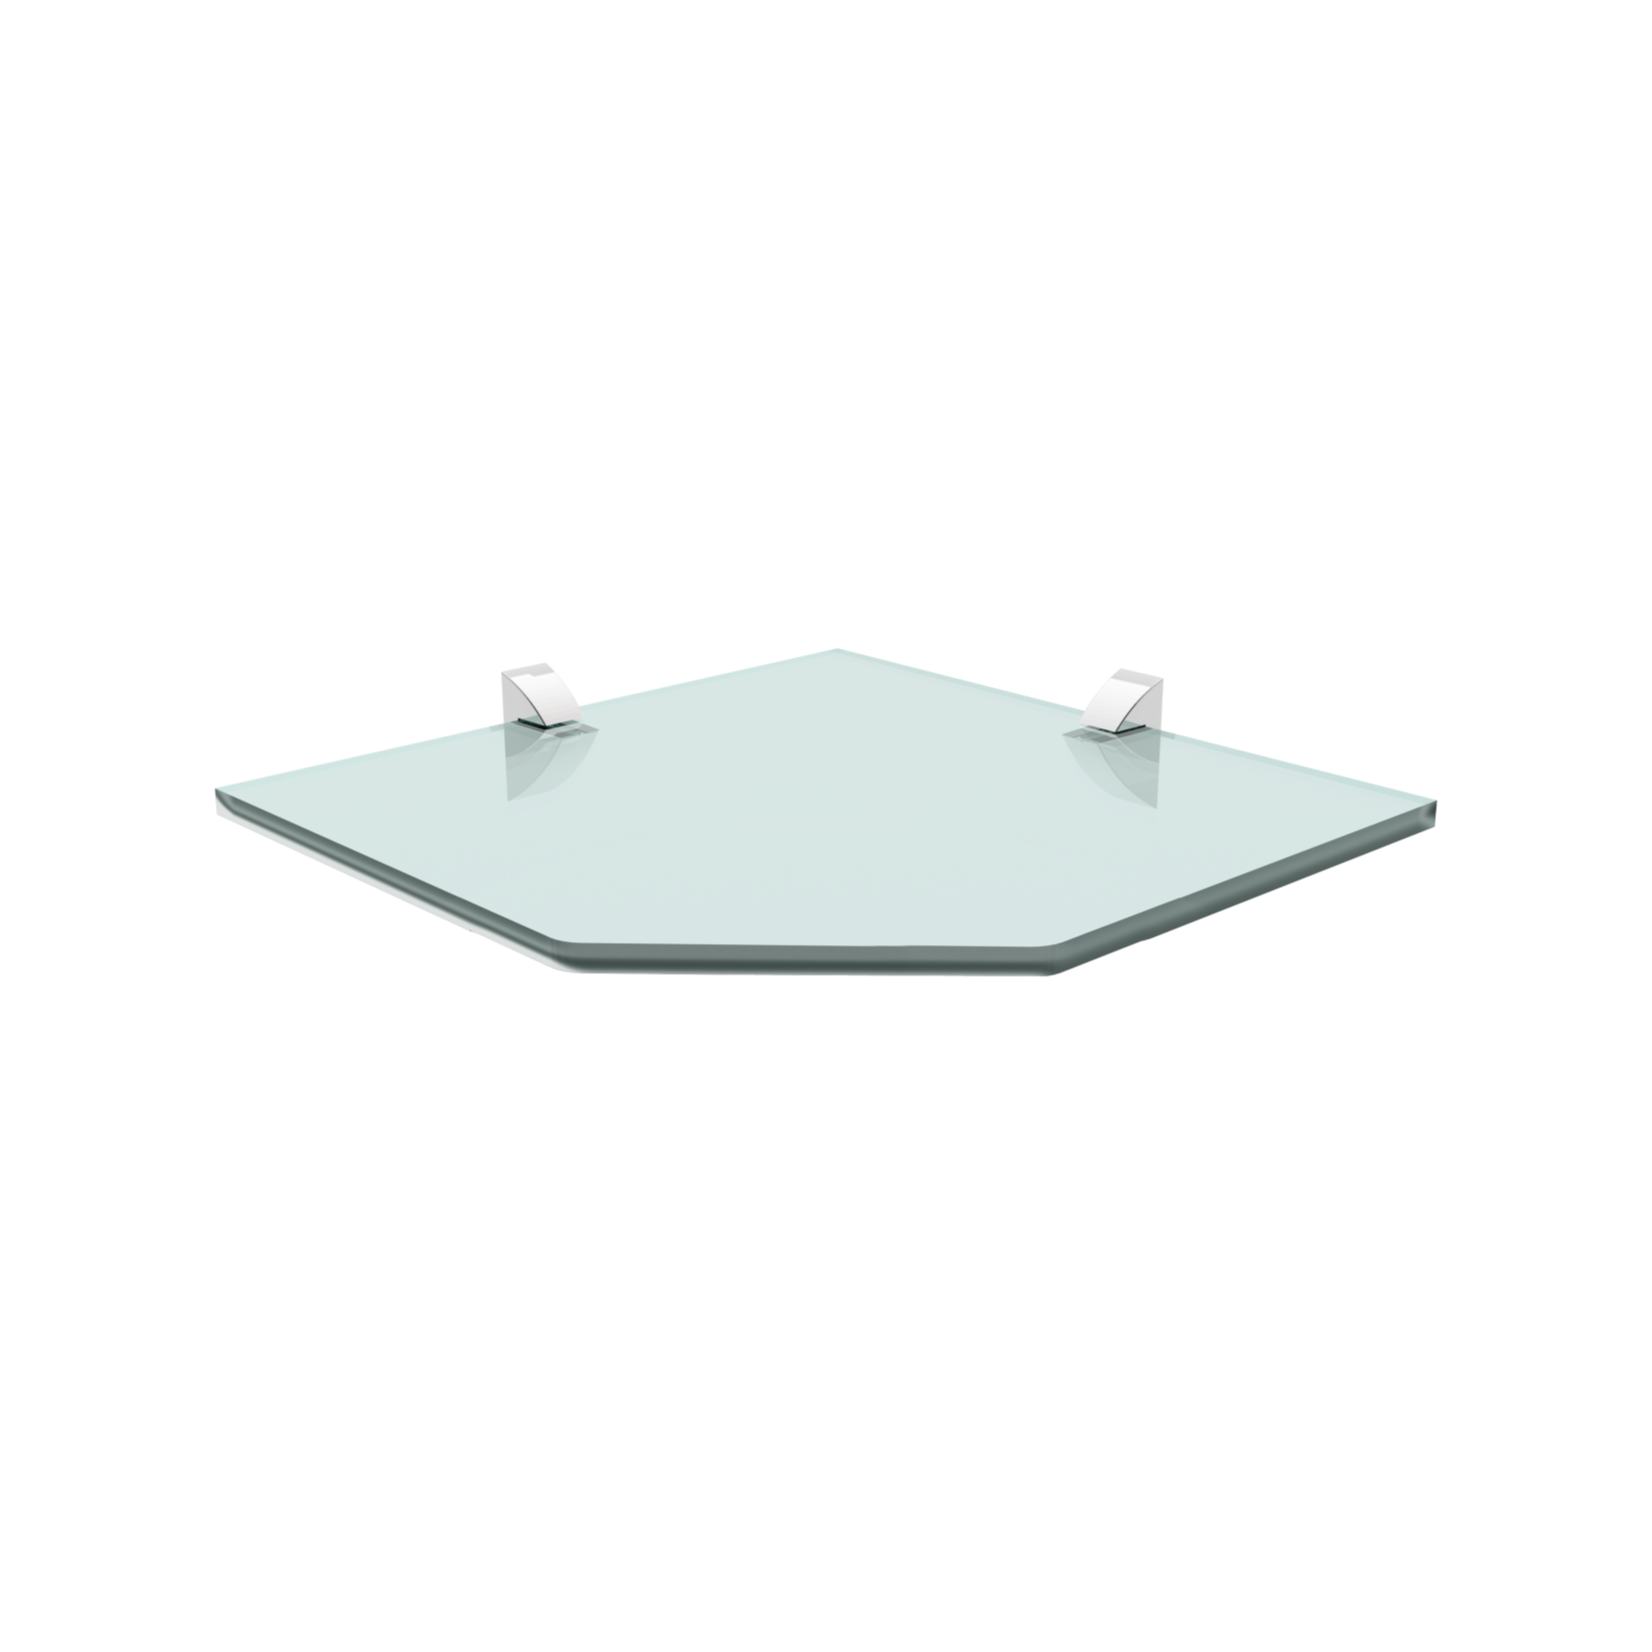 Prateleira de Vidro Recorte 25x25cm Incolor - Prat-k